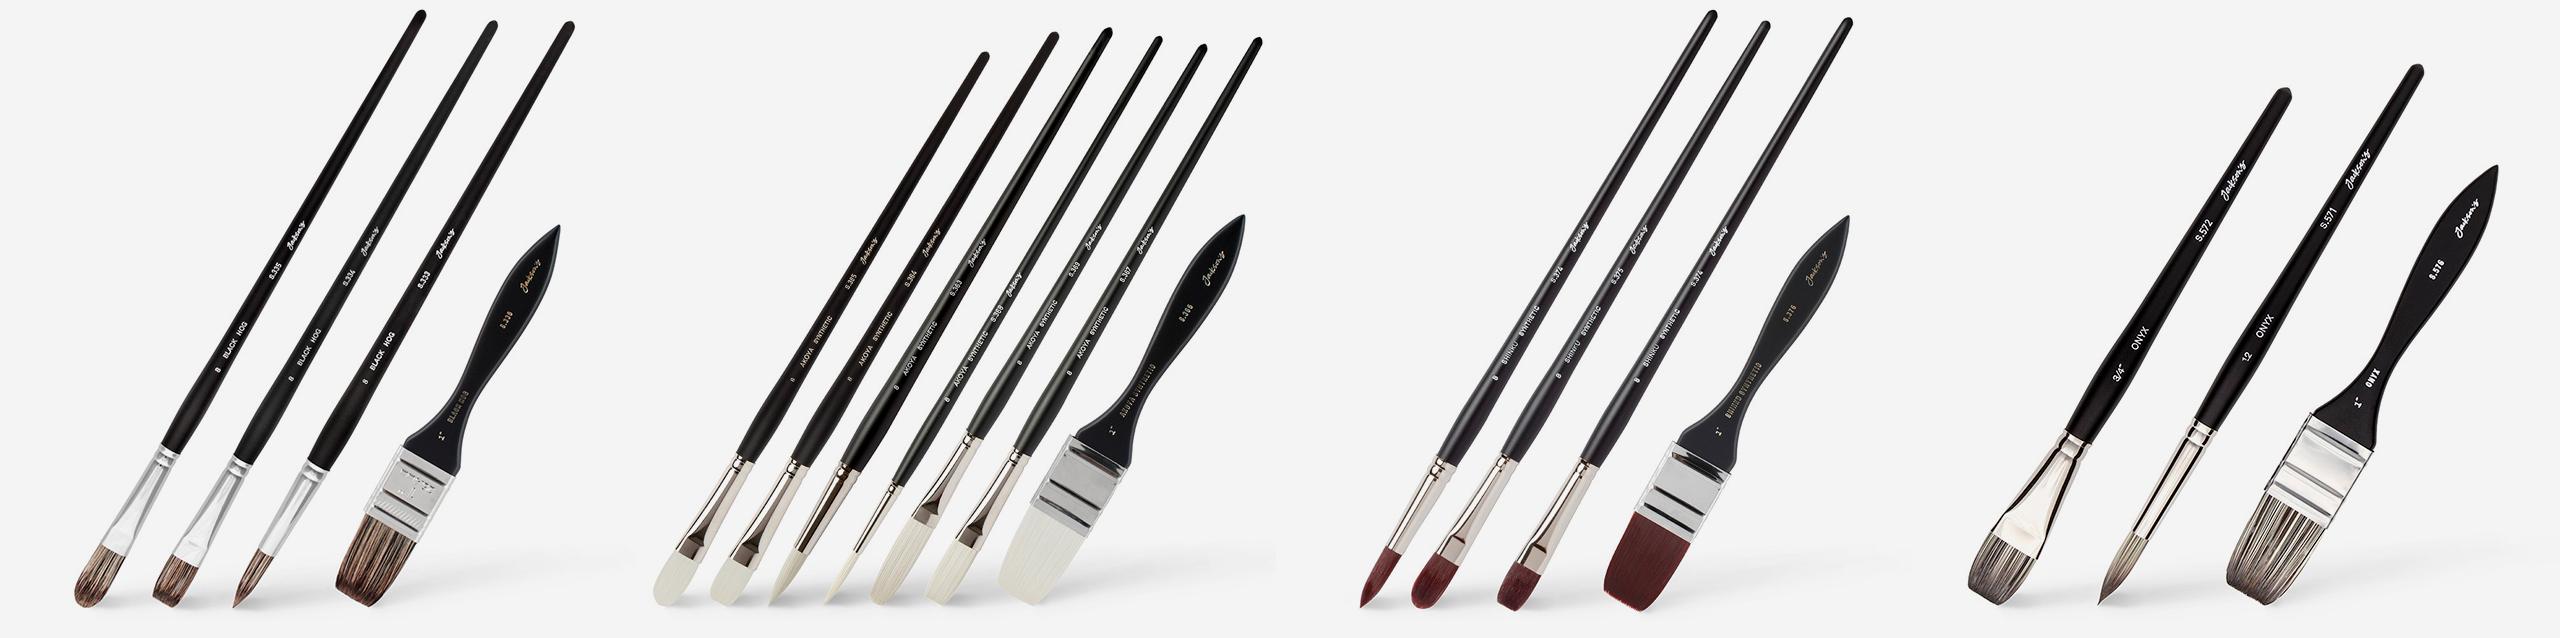 L-R: Jackson's Black Hog brushes, Jackson's Akoya Synthetic brushes, Jackson's Shinky Synthetic brushes, Jackson's Onyx brushes